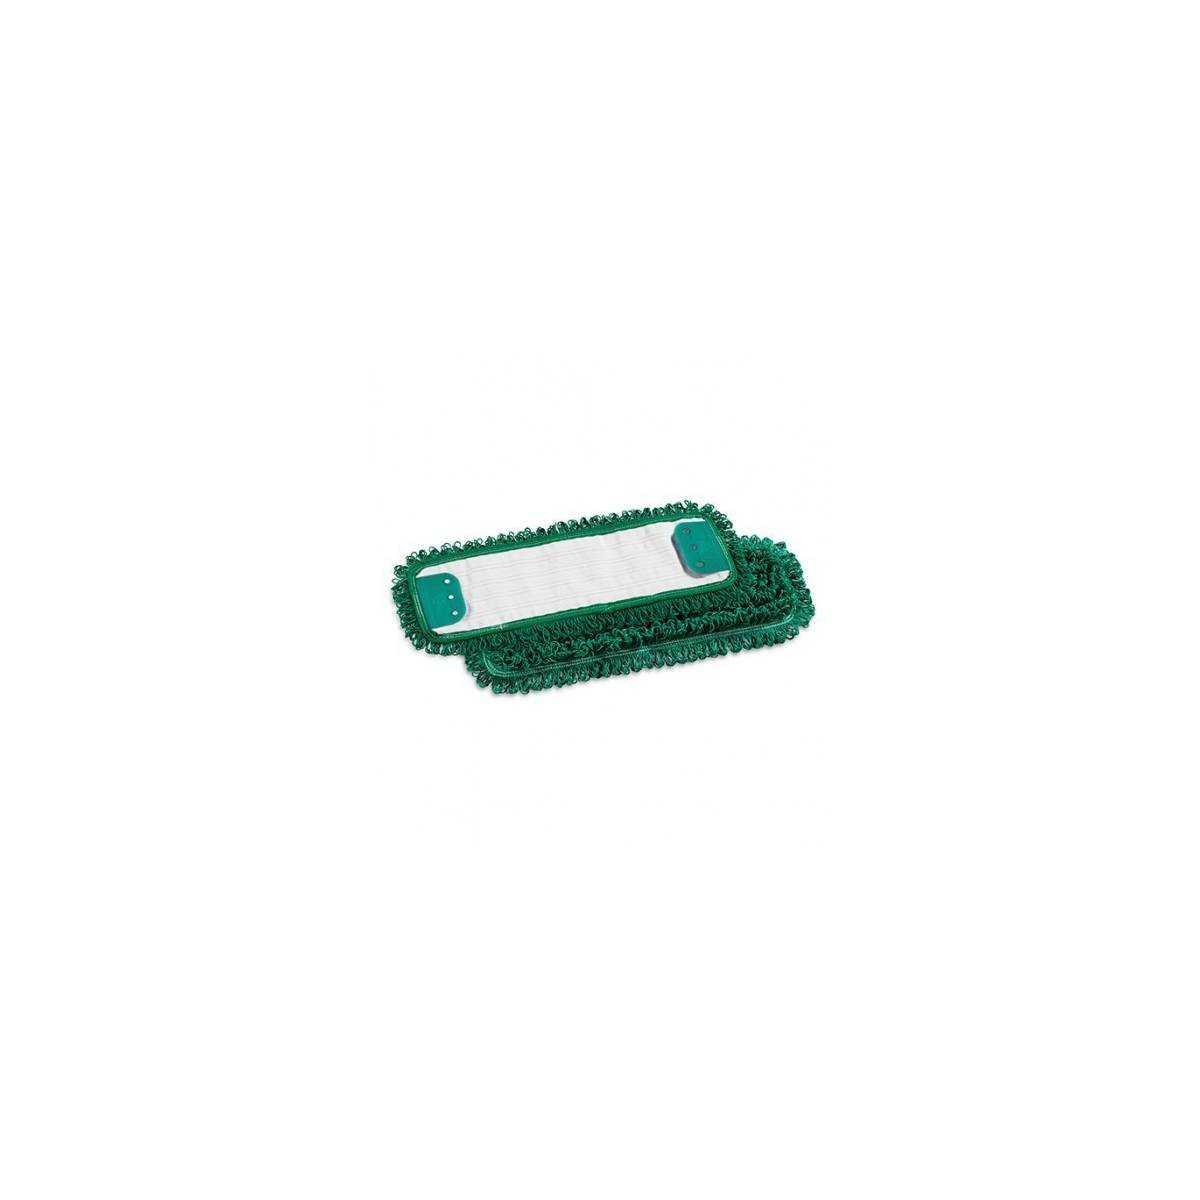 Моп Microriccio Wet System микрофибра 40см (Зеленый цвет) 0V000694MV TTS